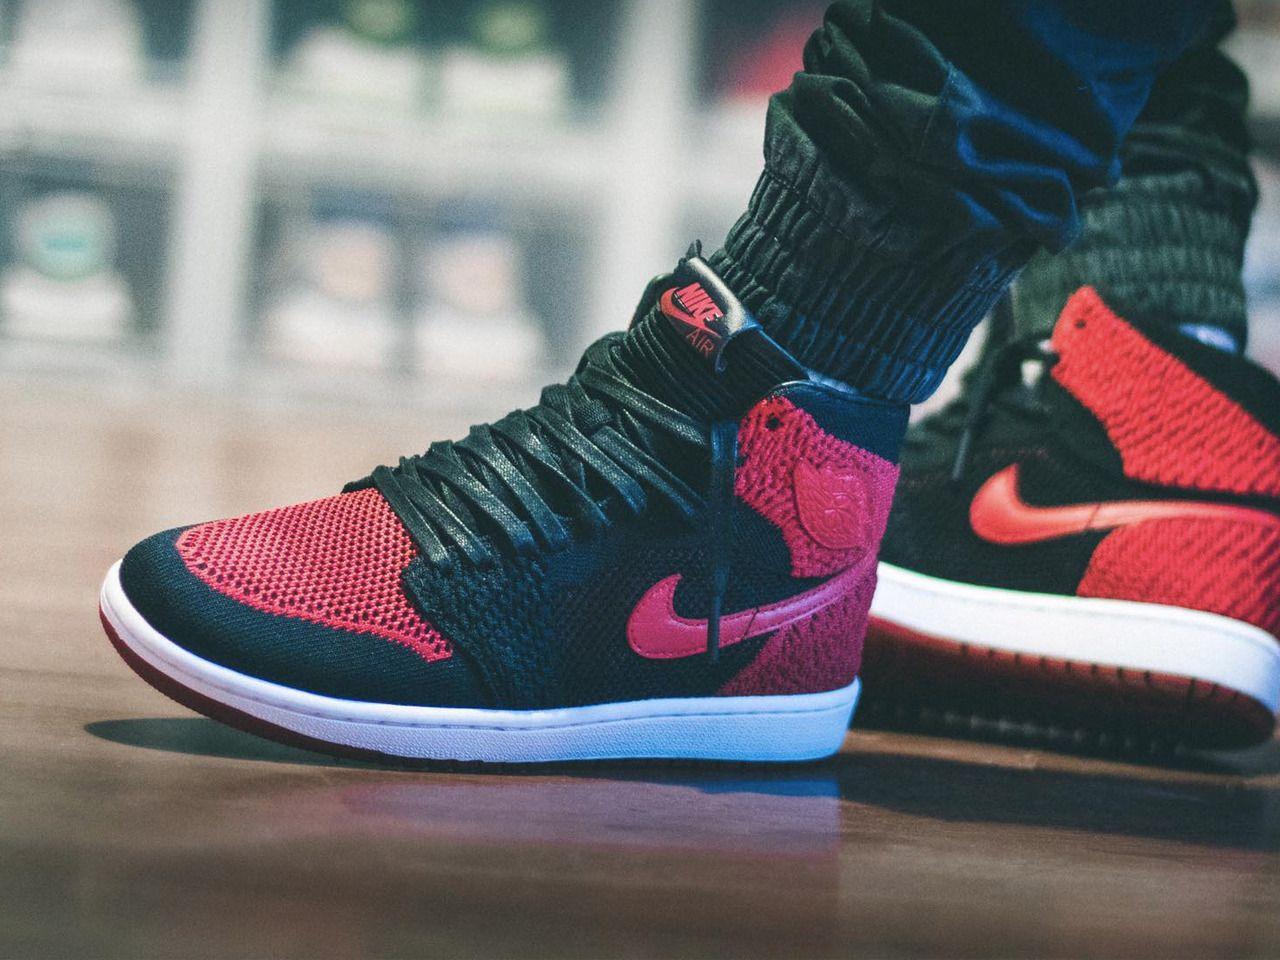 Nike Air Jordan 1 Flyknit Banned - 2017 (by maikelboeve)